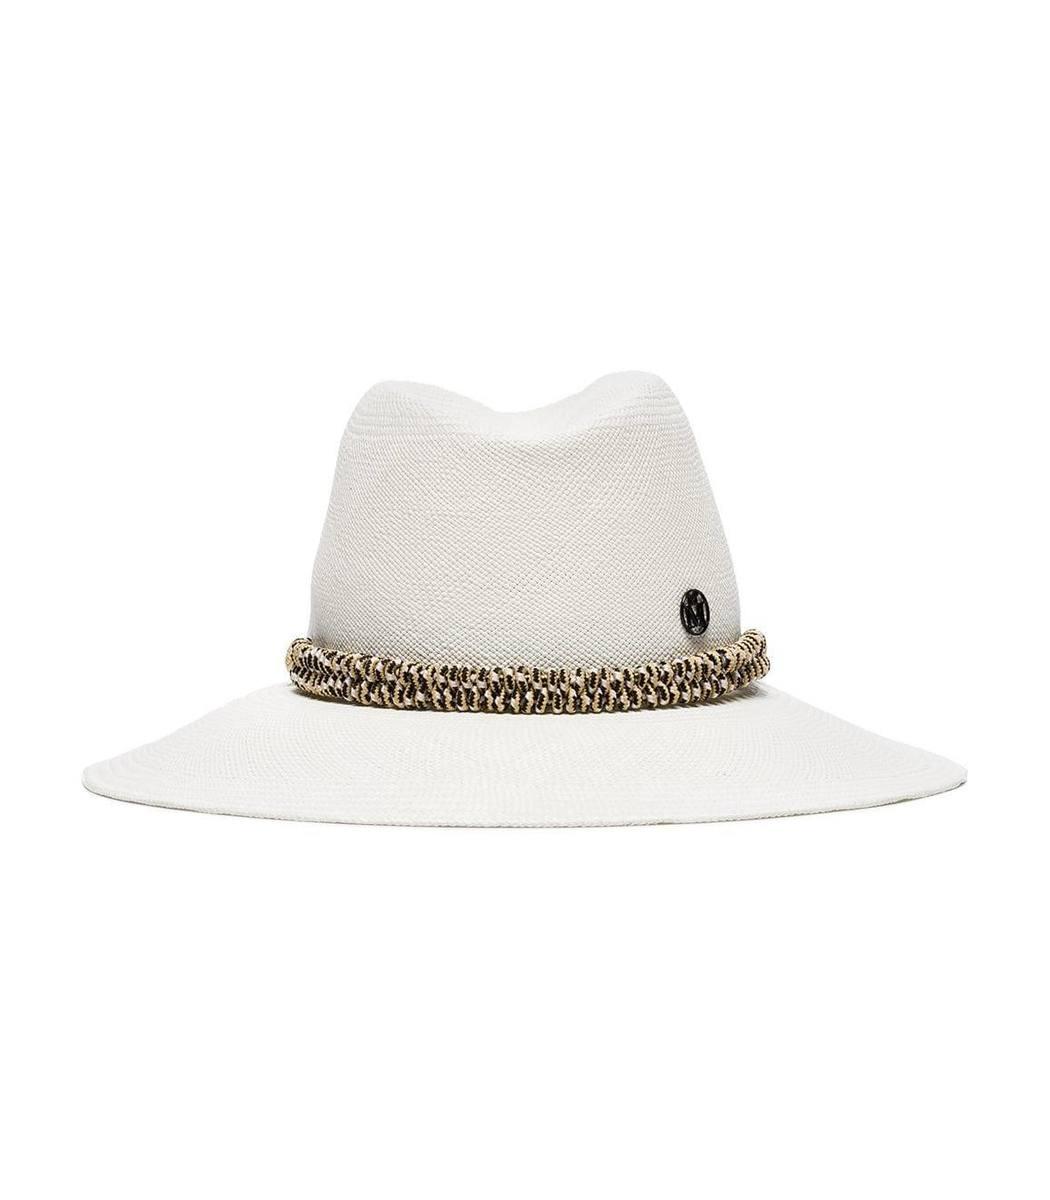 Maison Michel Hats Kate Straw Hat